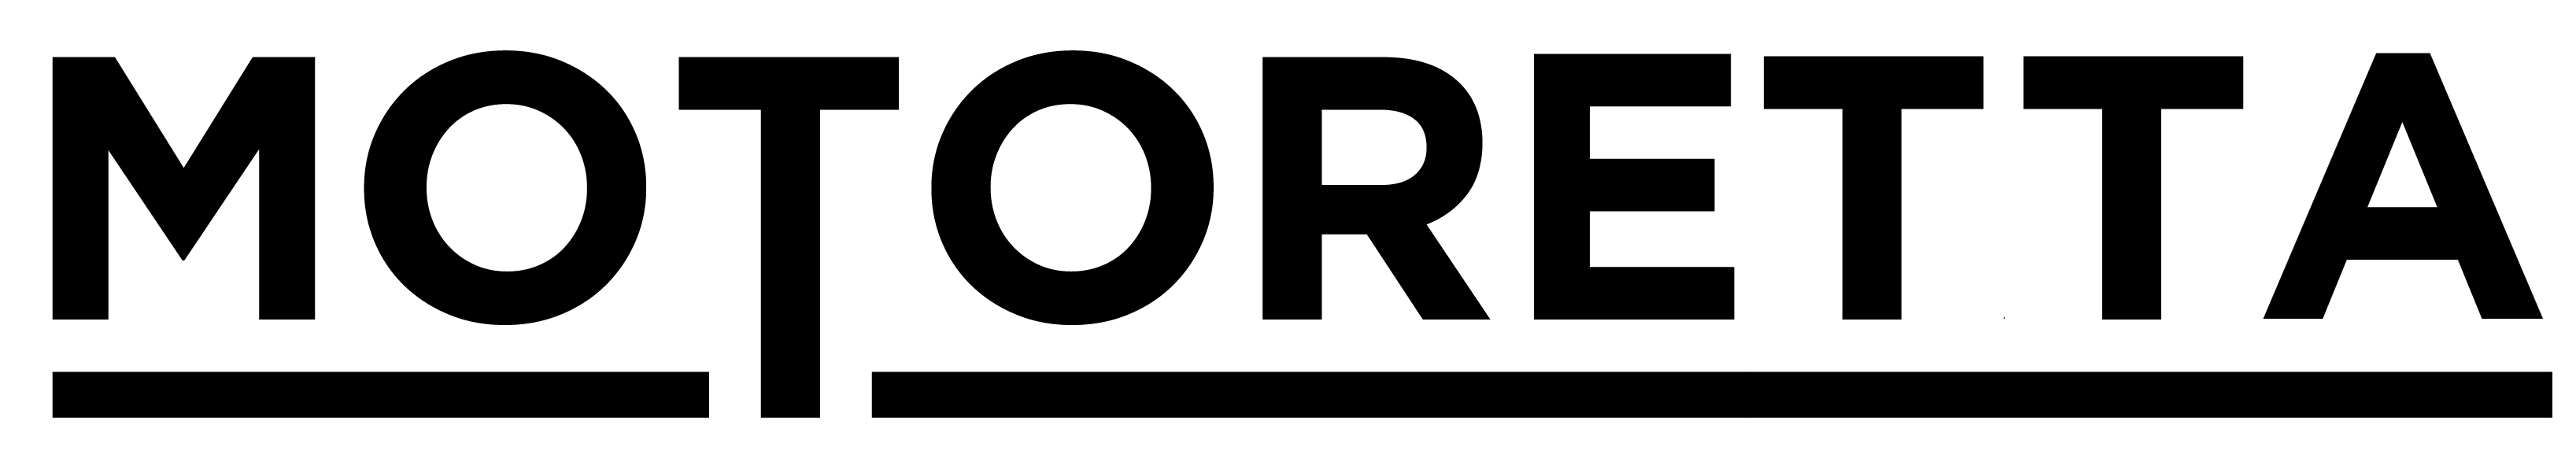 Motoretta-logo